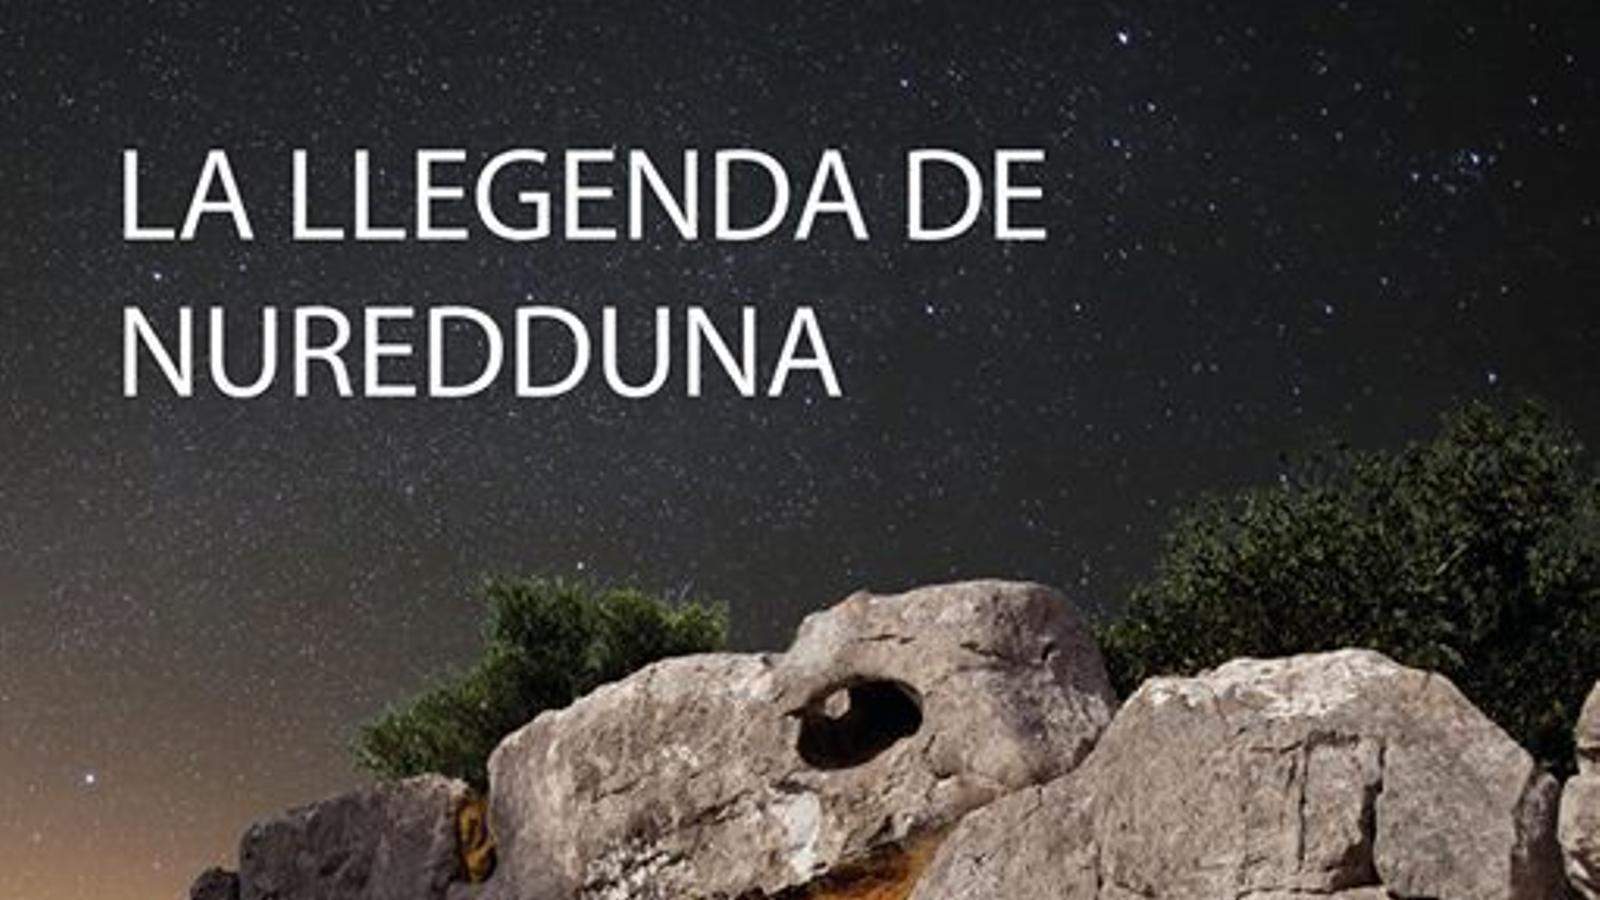 'La llegenda de Nuredduna'